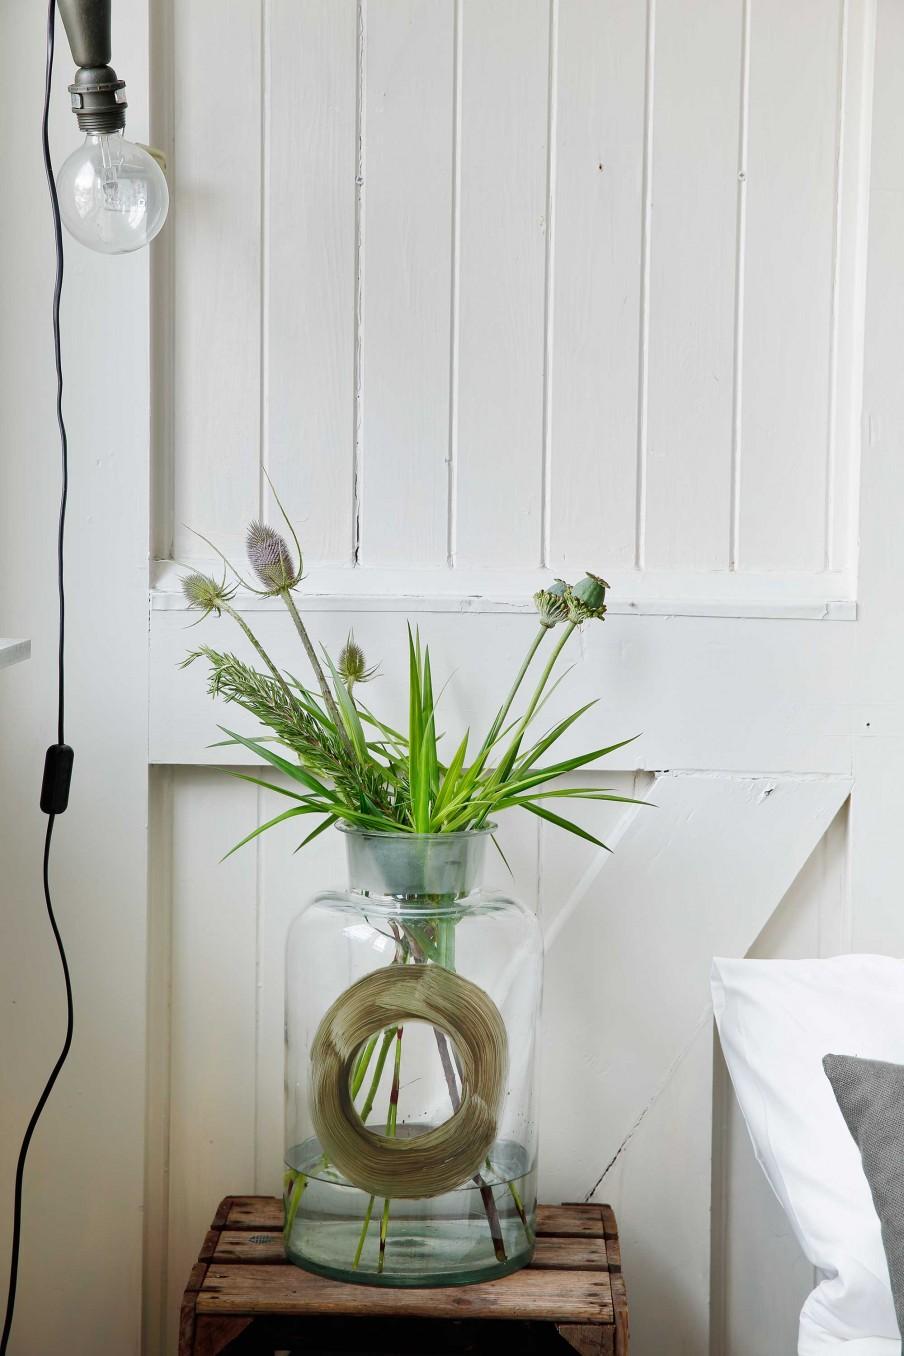 mesita auxiliar, caja madera, caja de fruta, vintage, jarron cristal, lampara, estilo nordico, alquimia deco